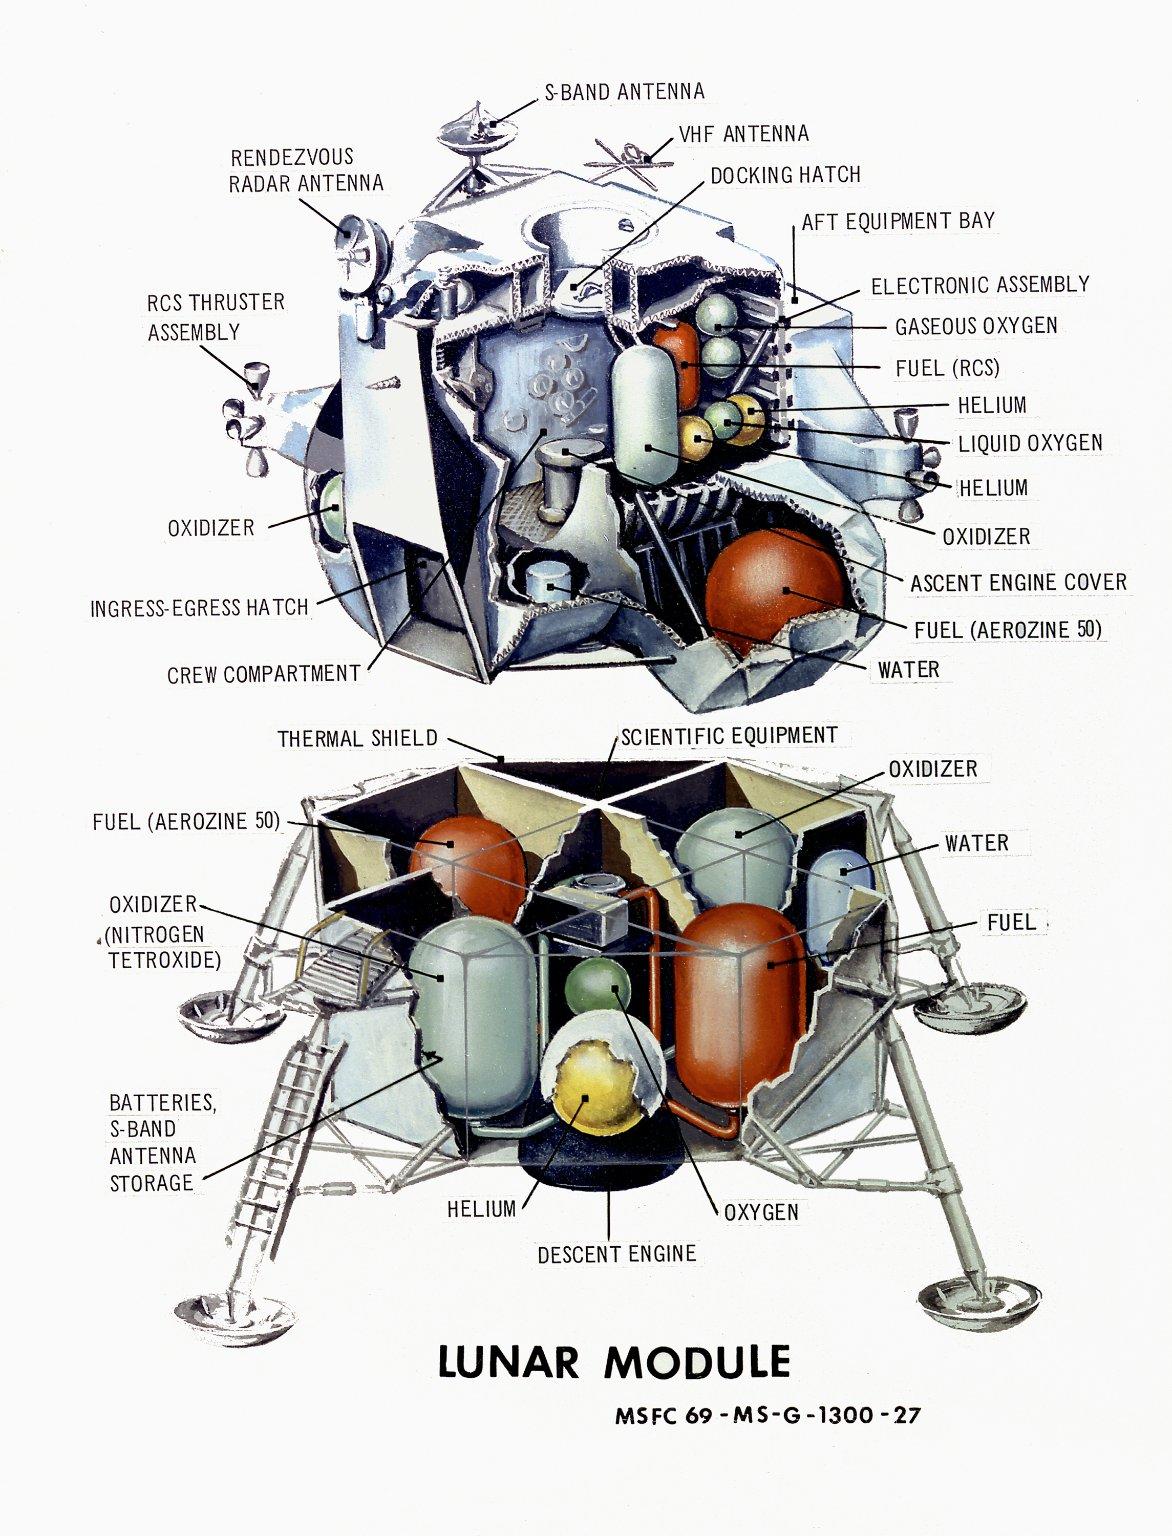 apollo 11 lunar module diagram 1991 ez go textron wiring scematics - pics about space